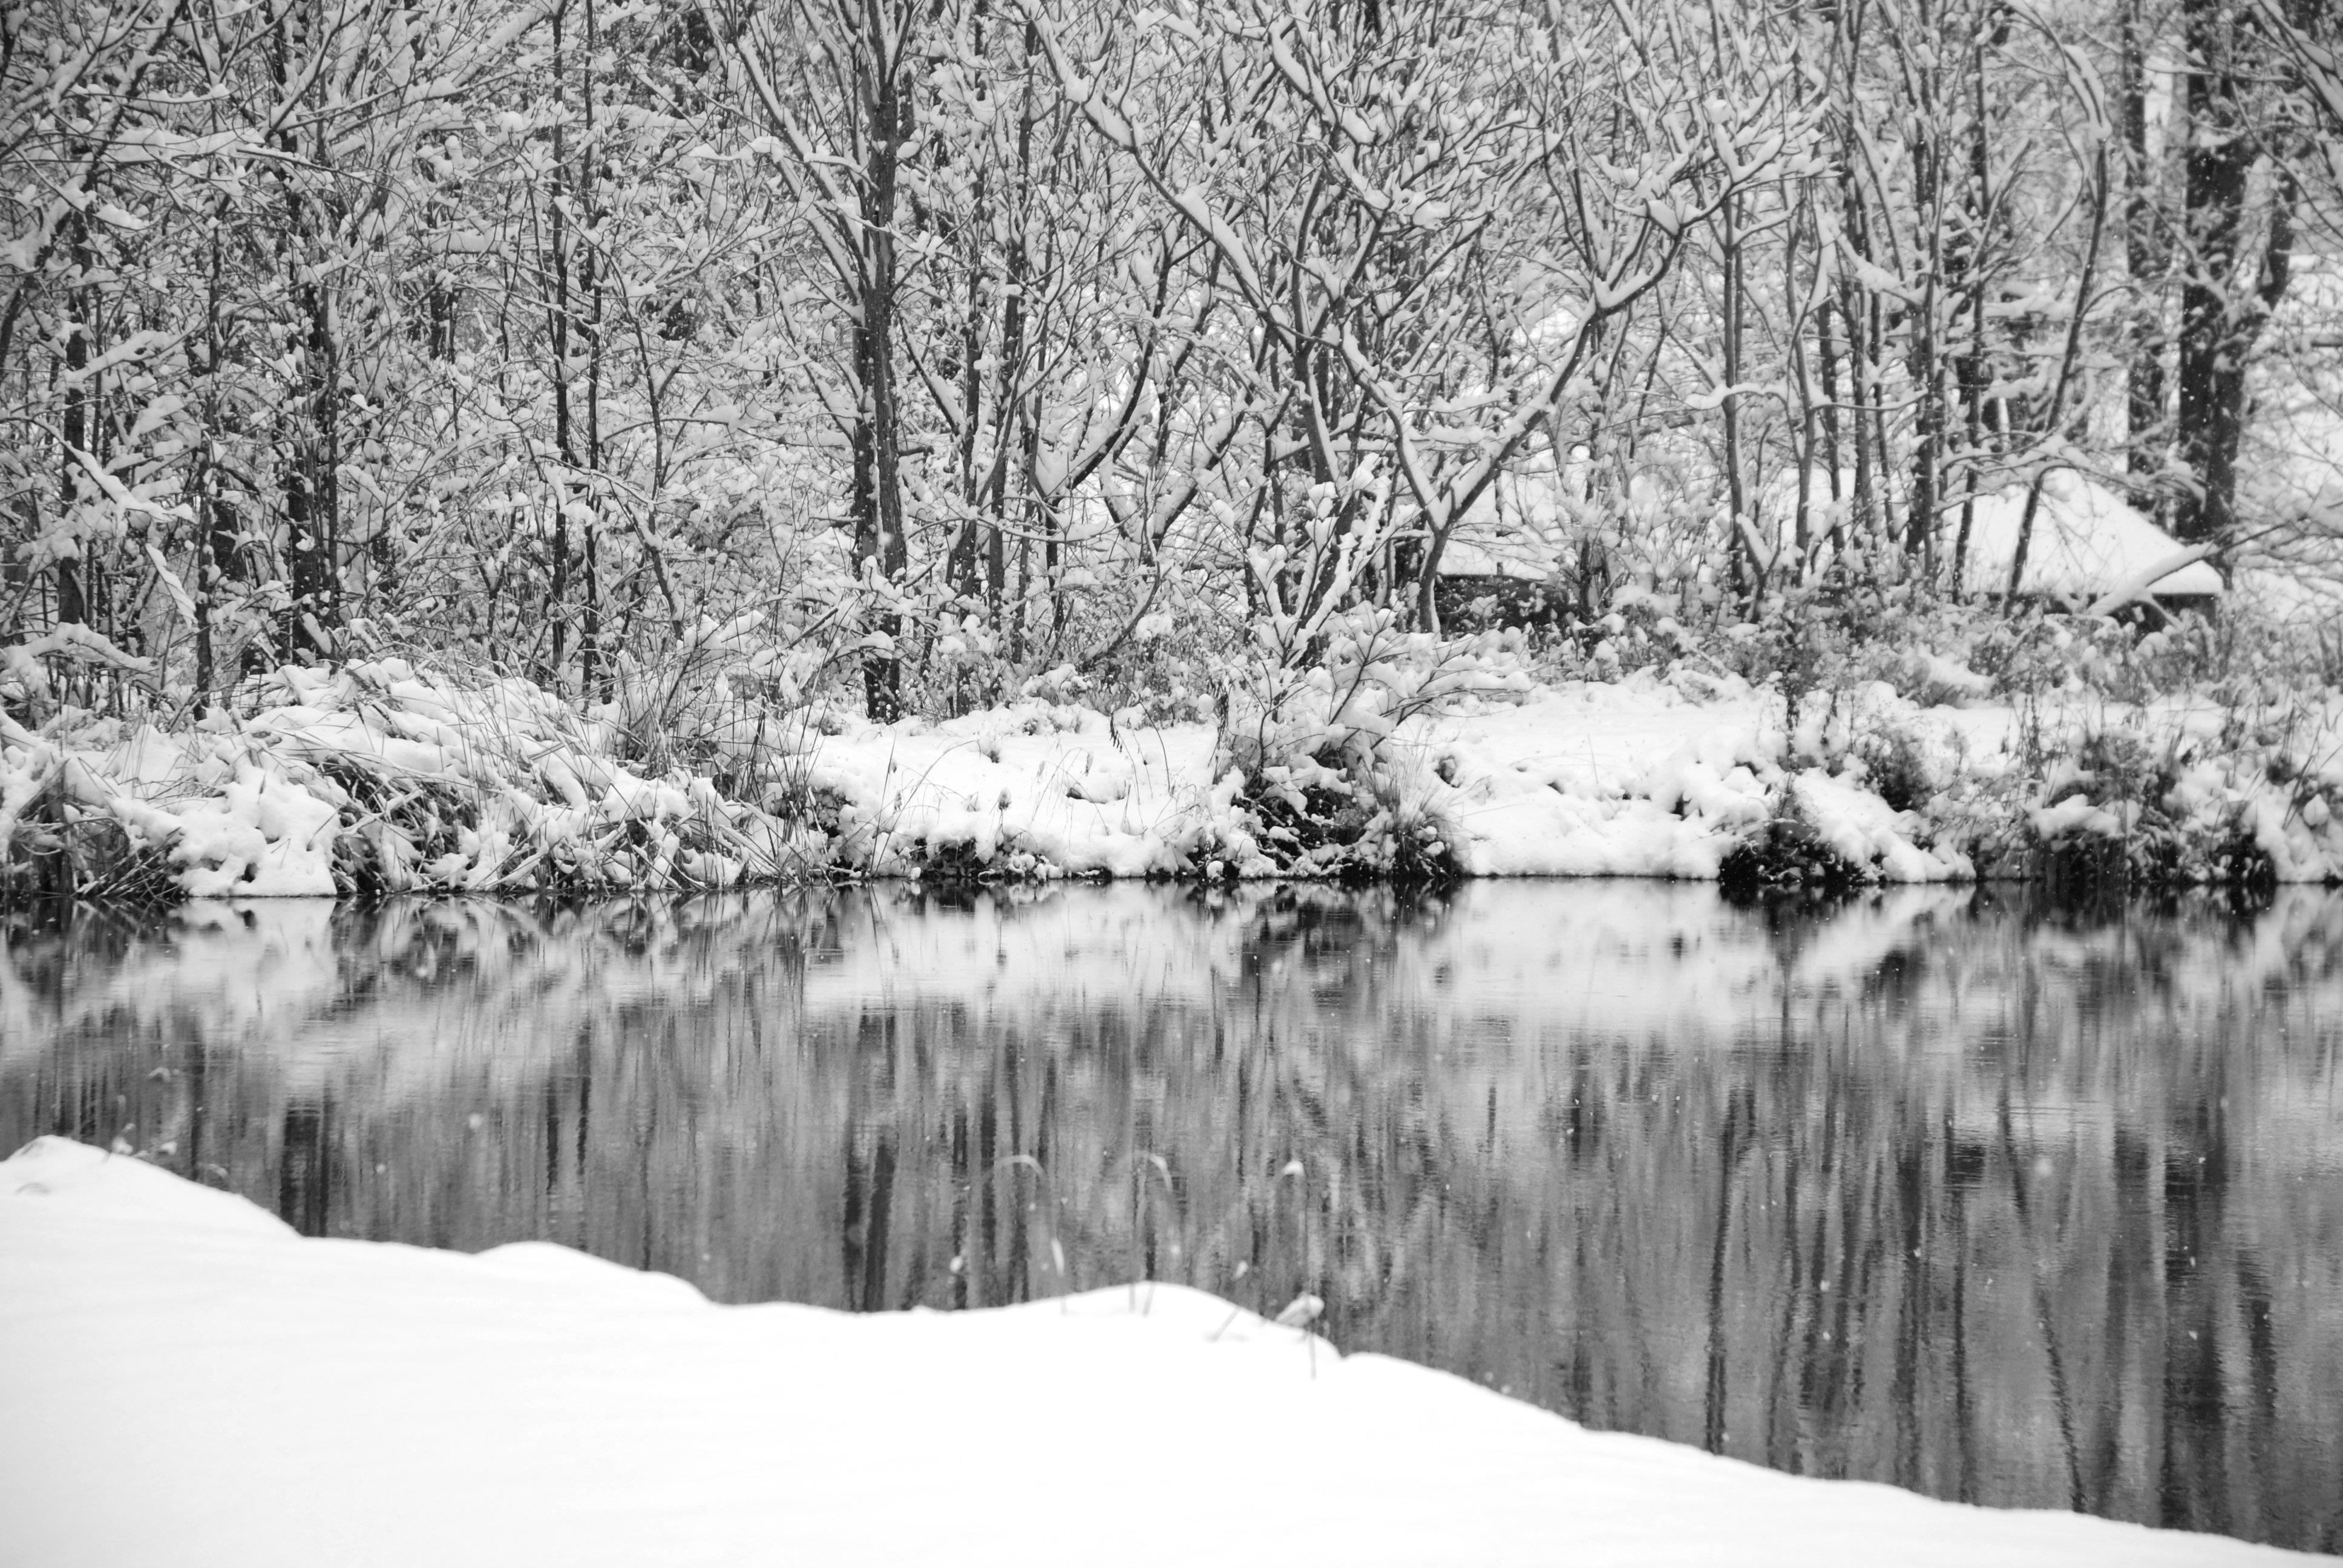 pond-scene-b-and-w.jpg